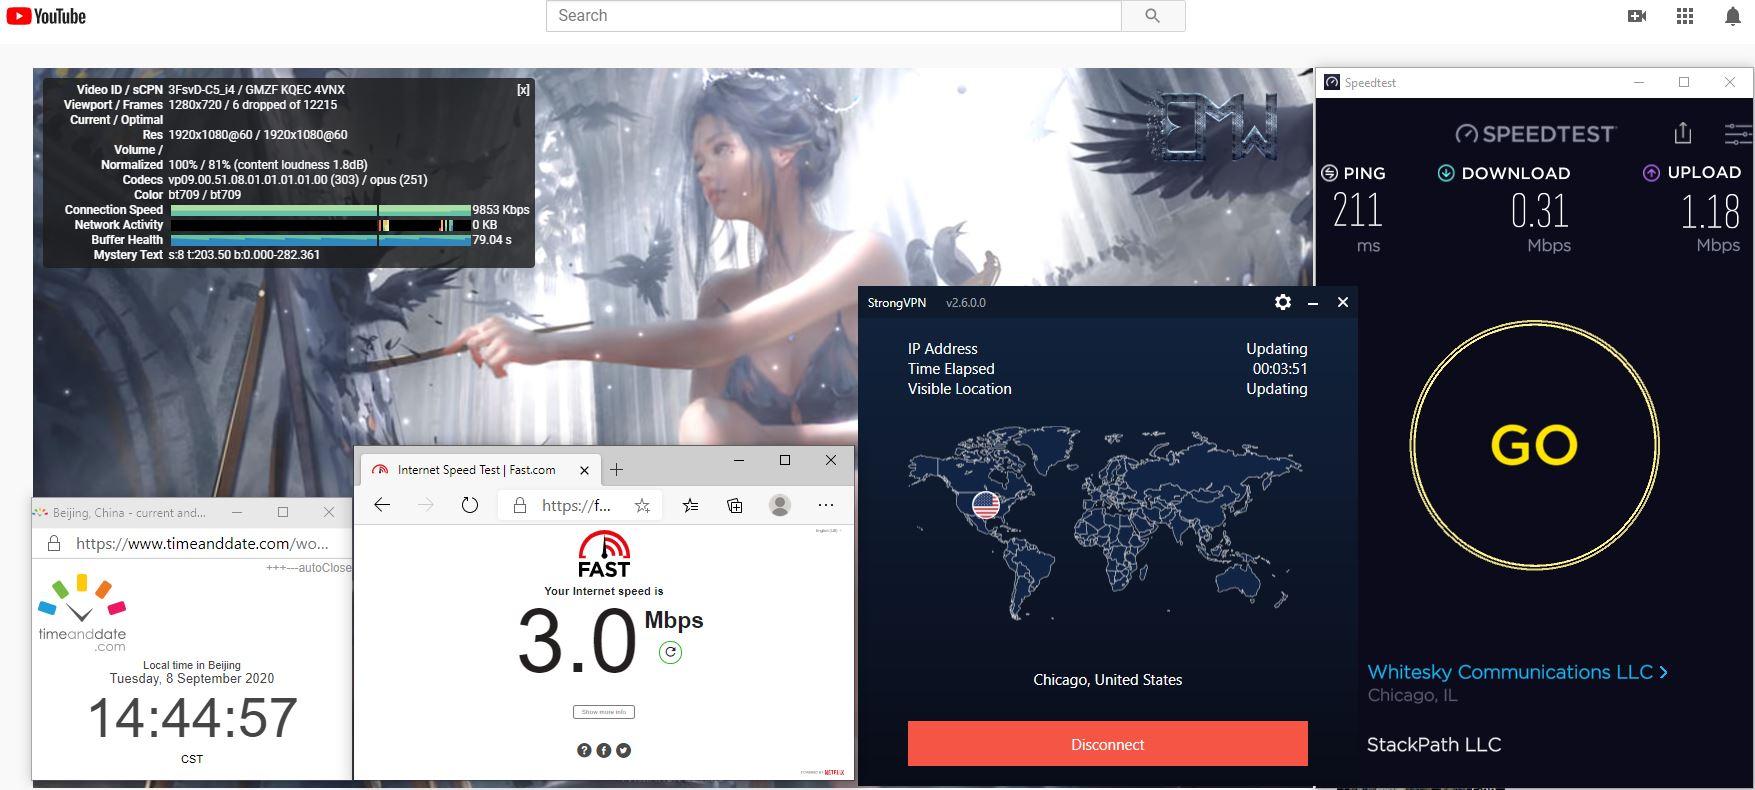 Windows10 StrongVPN USA - Chicago 中国VPN 翻墙 科学上网 翻墙速度测试 - 20200908